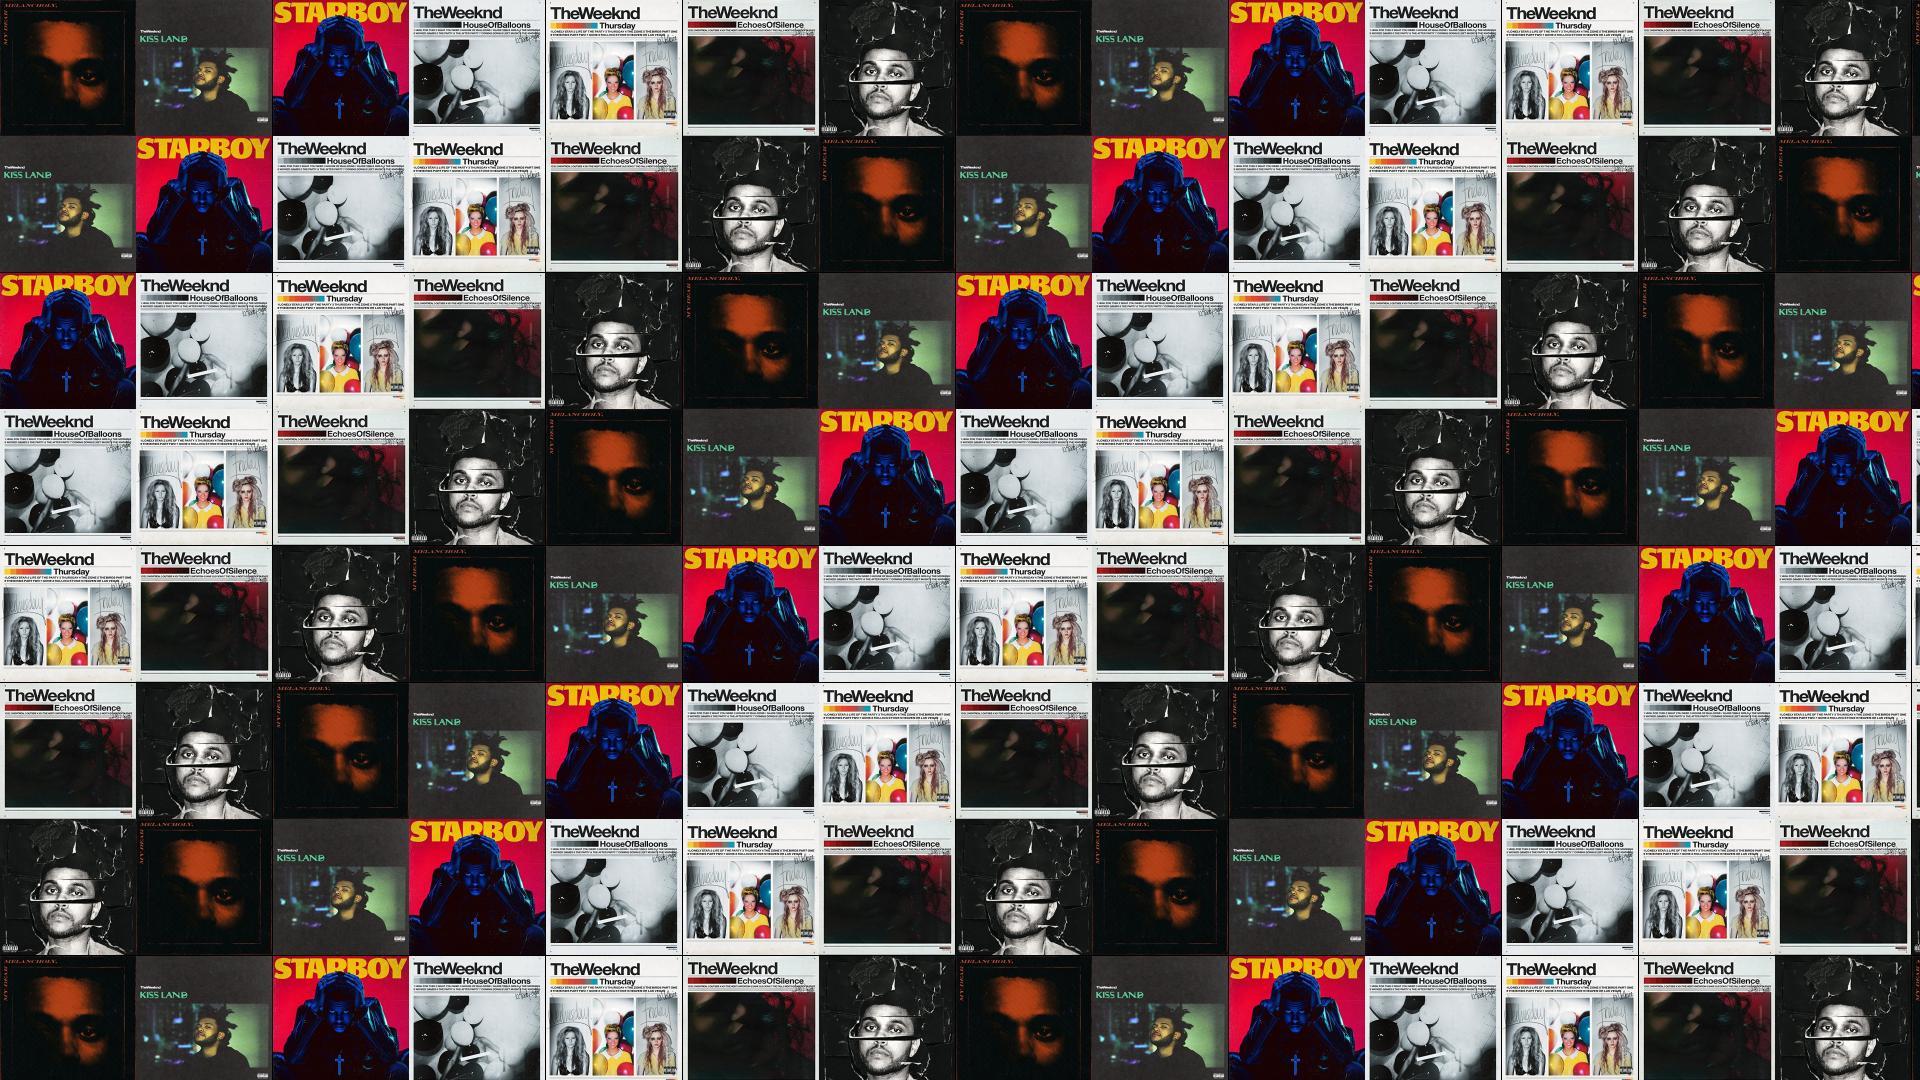 The Weeknd Tiled Desktop Wallpaper